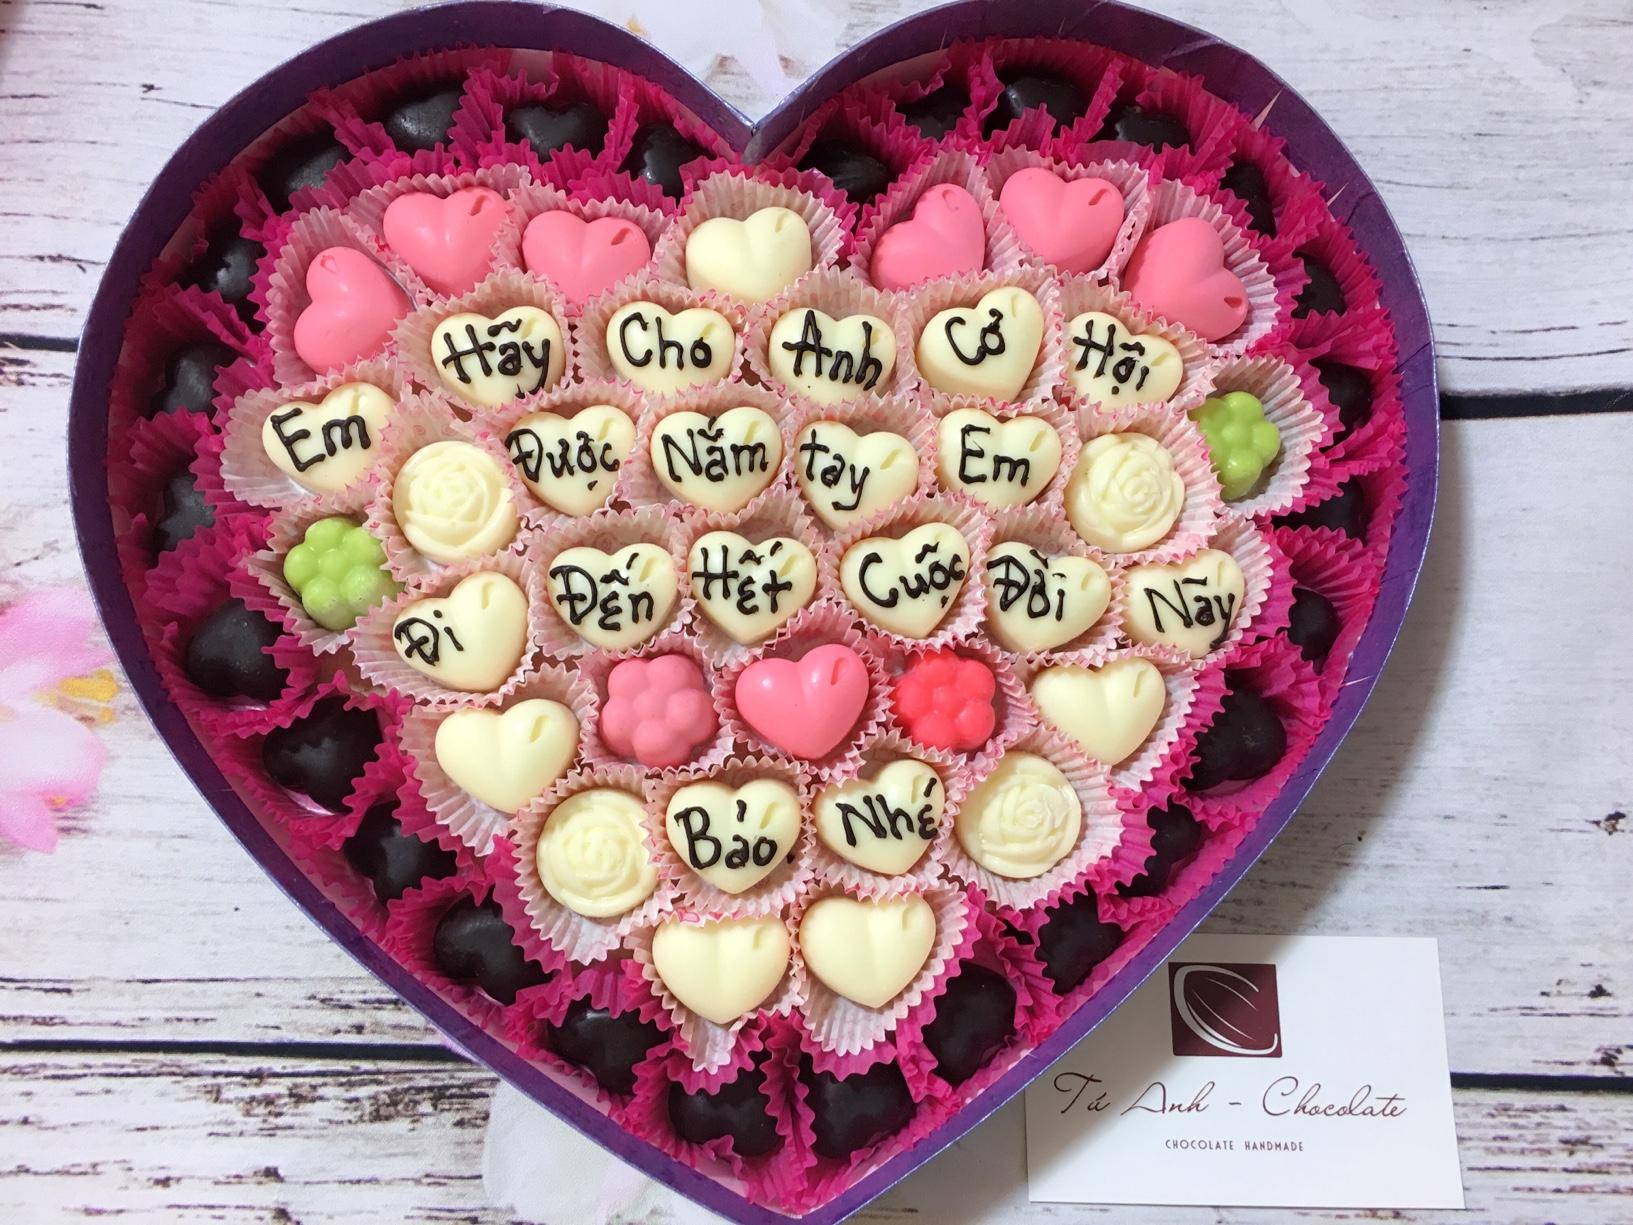 Chocolate Valentine 14/2